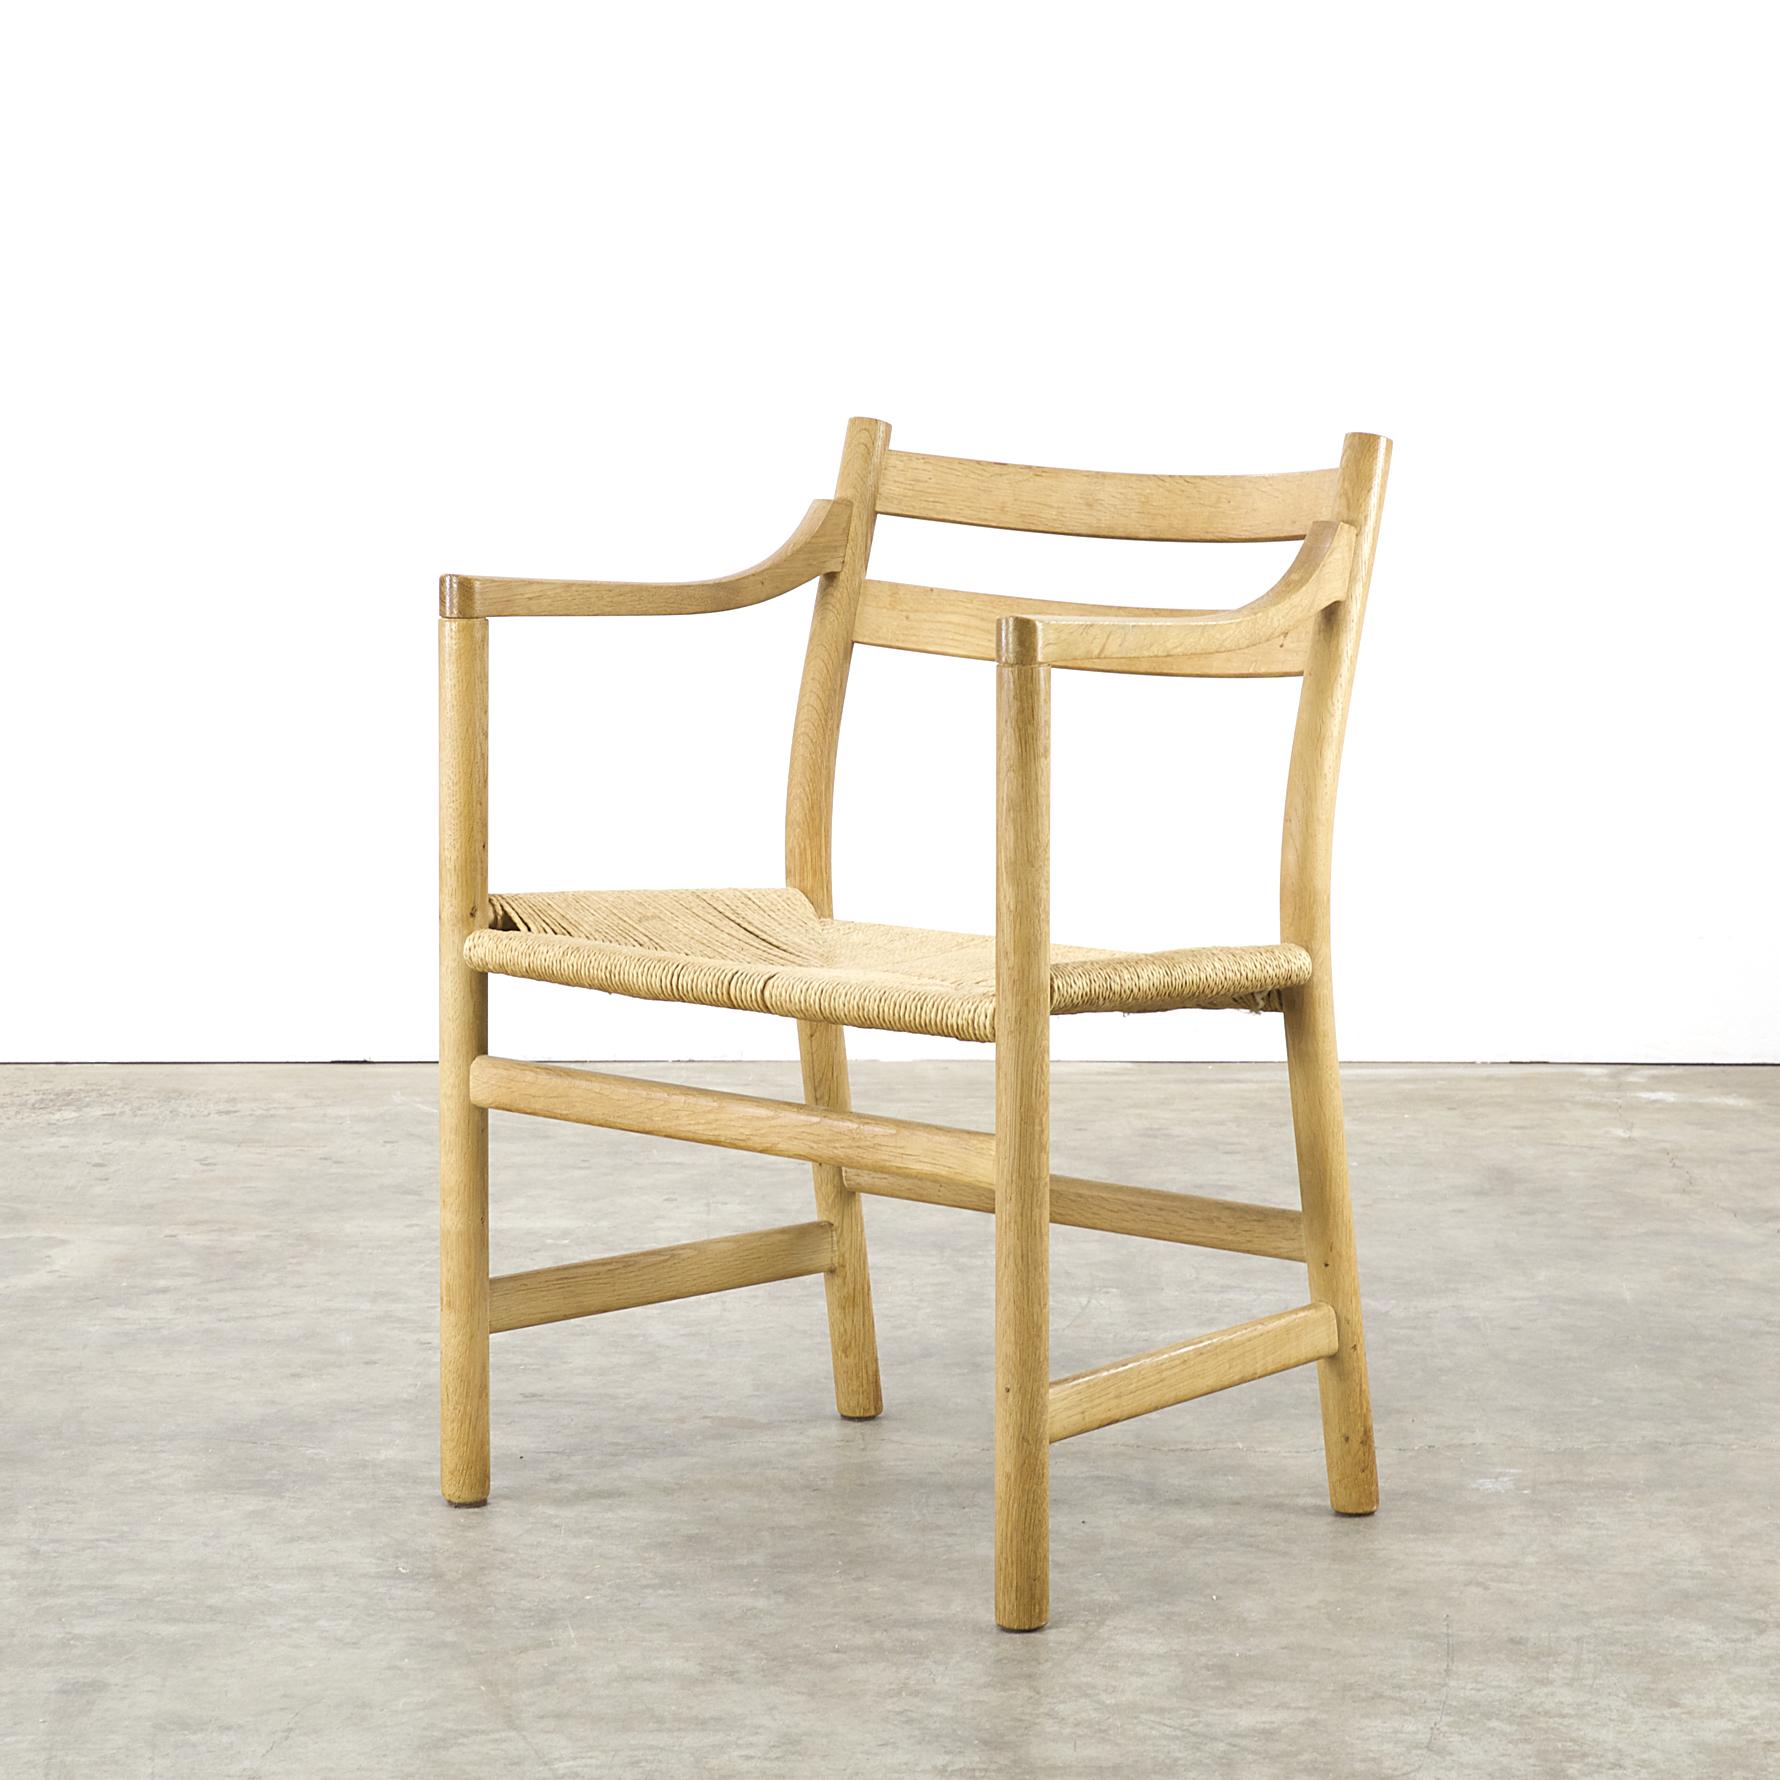 50s hans j wegner ch46 dining chair for carl hansen son set 4 barbmama. Black Bedroom Furniture Sets. Home Design Ideas